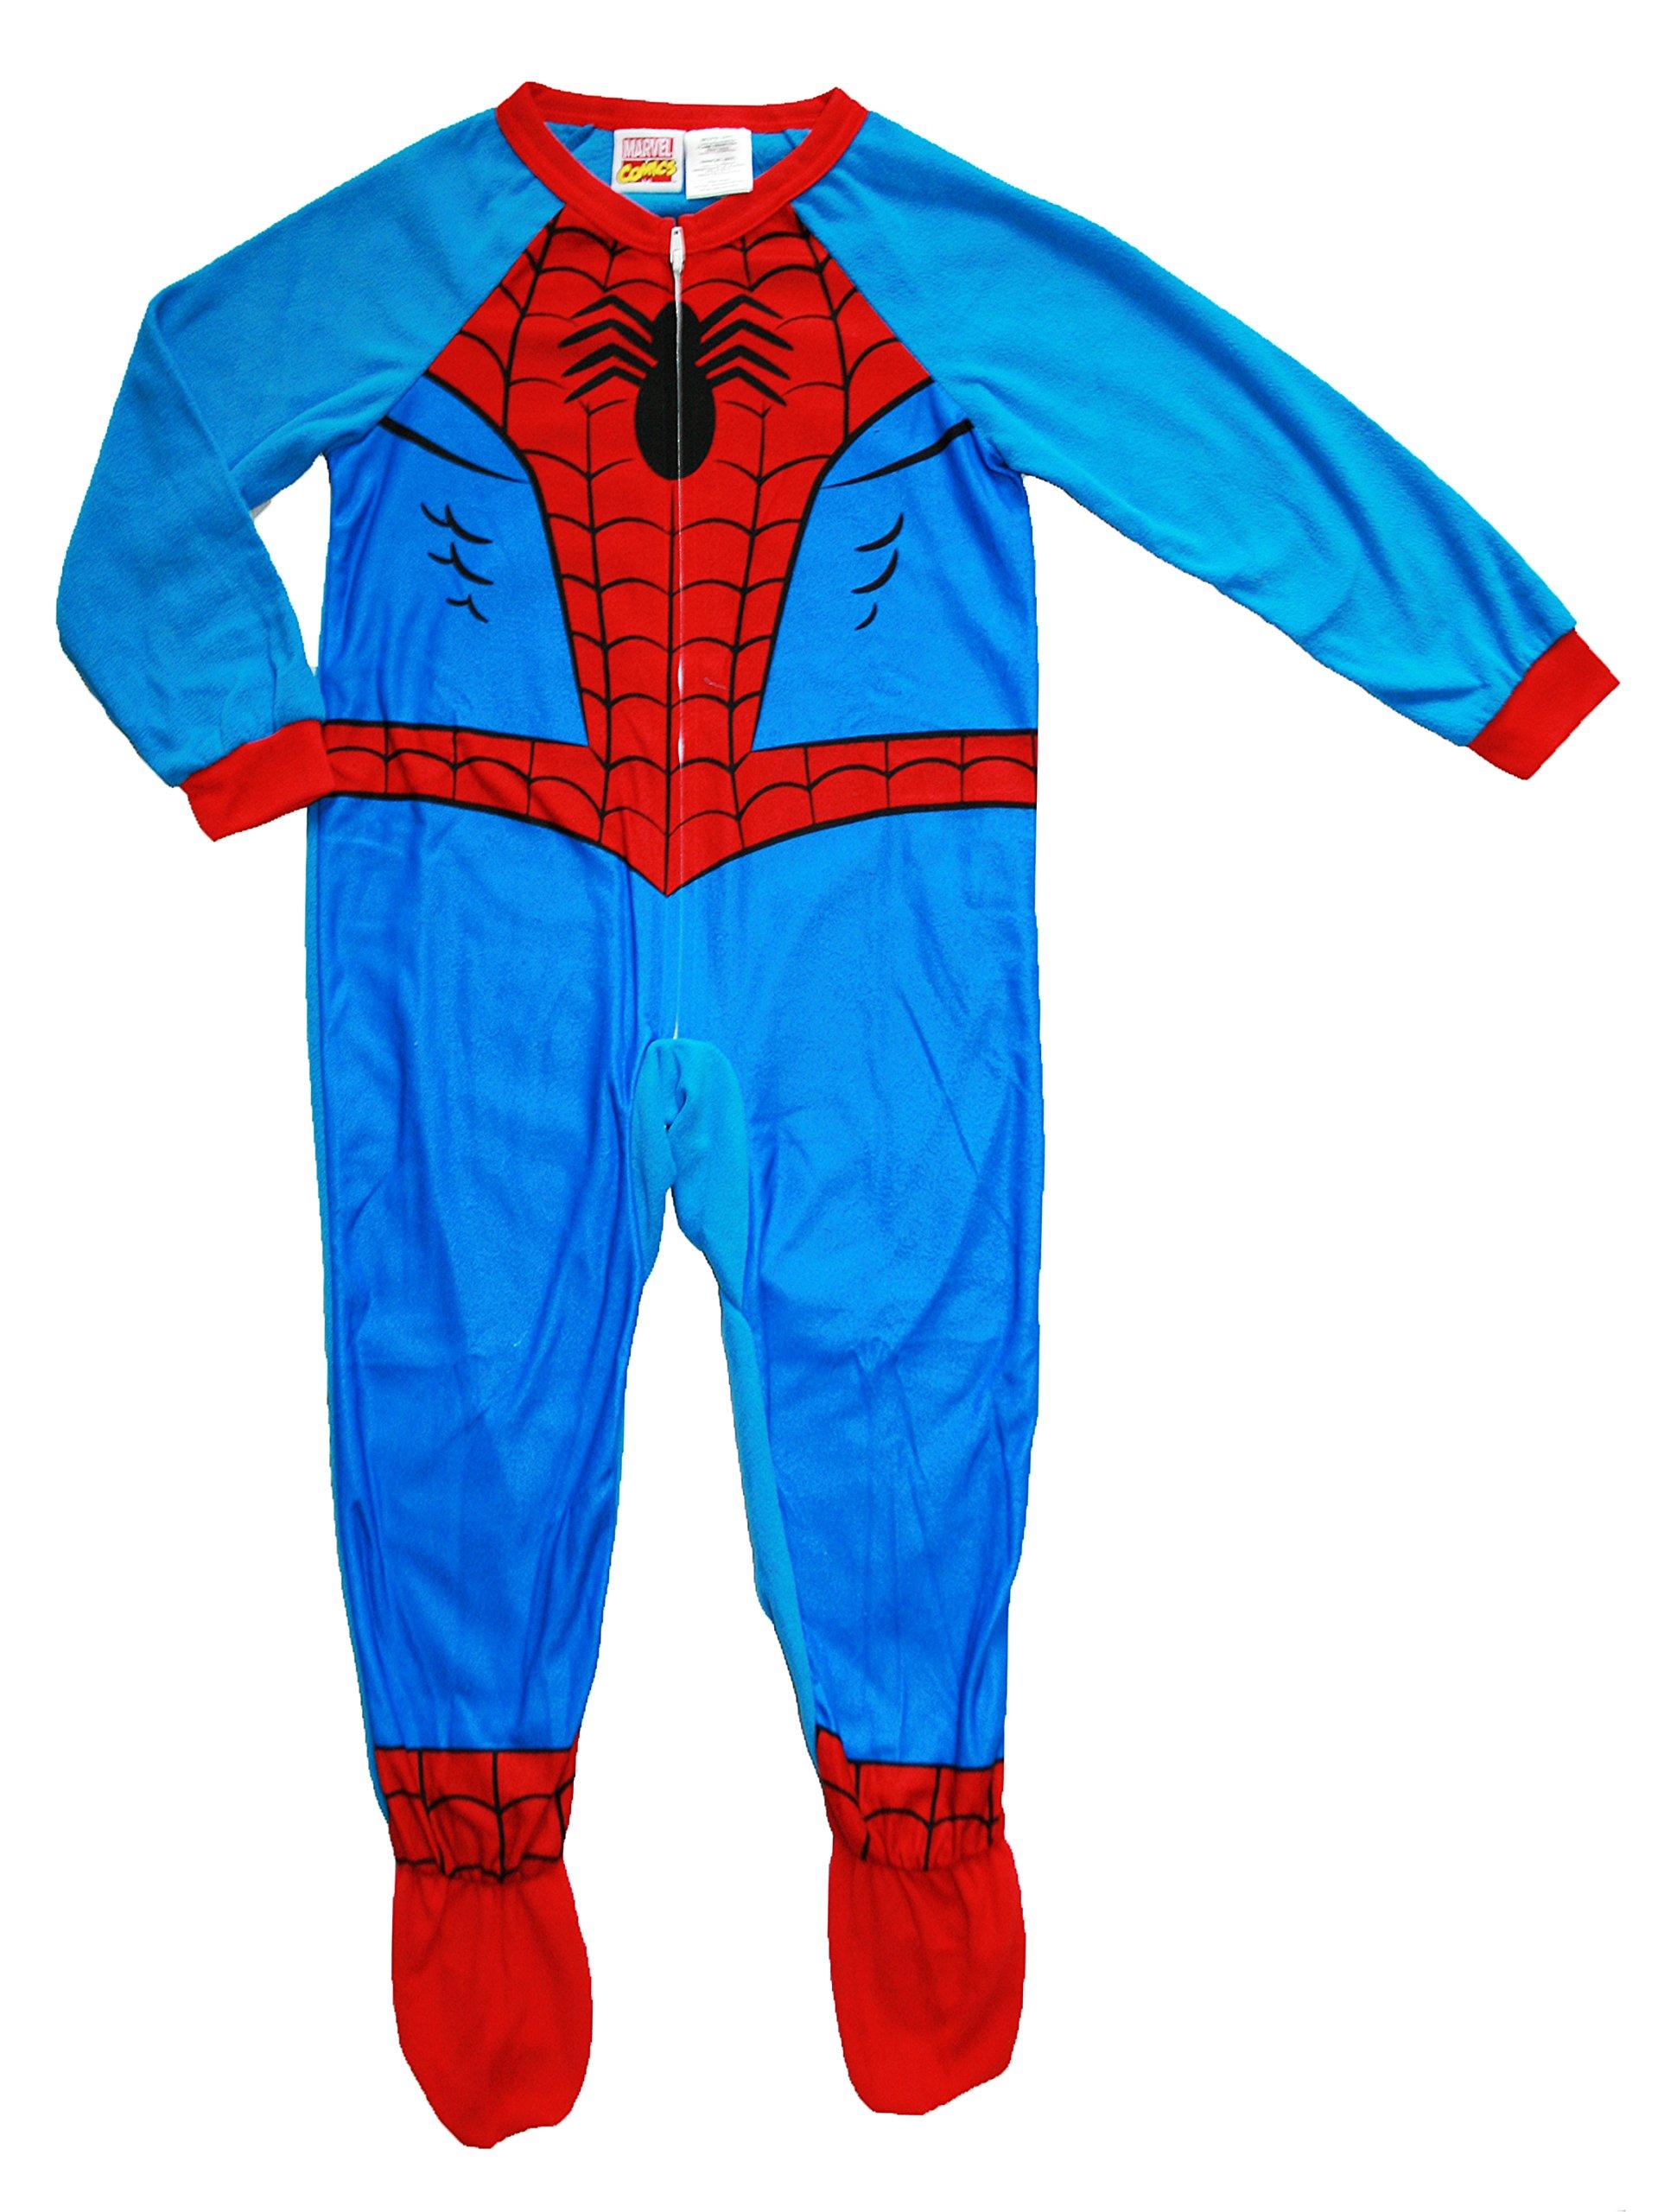 Marvel Spiderman Boy Footed Sleeper Blanket Pajama Size 8